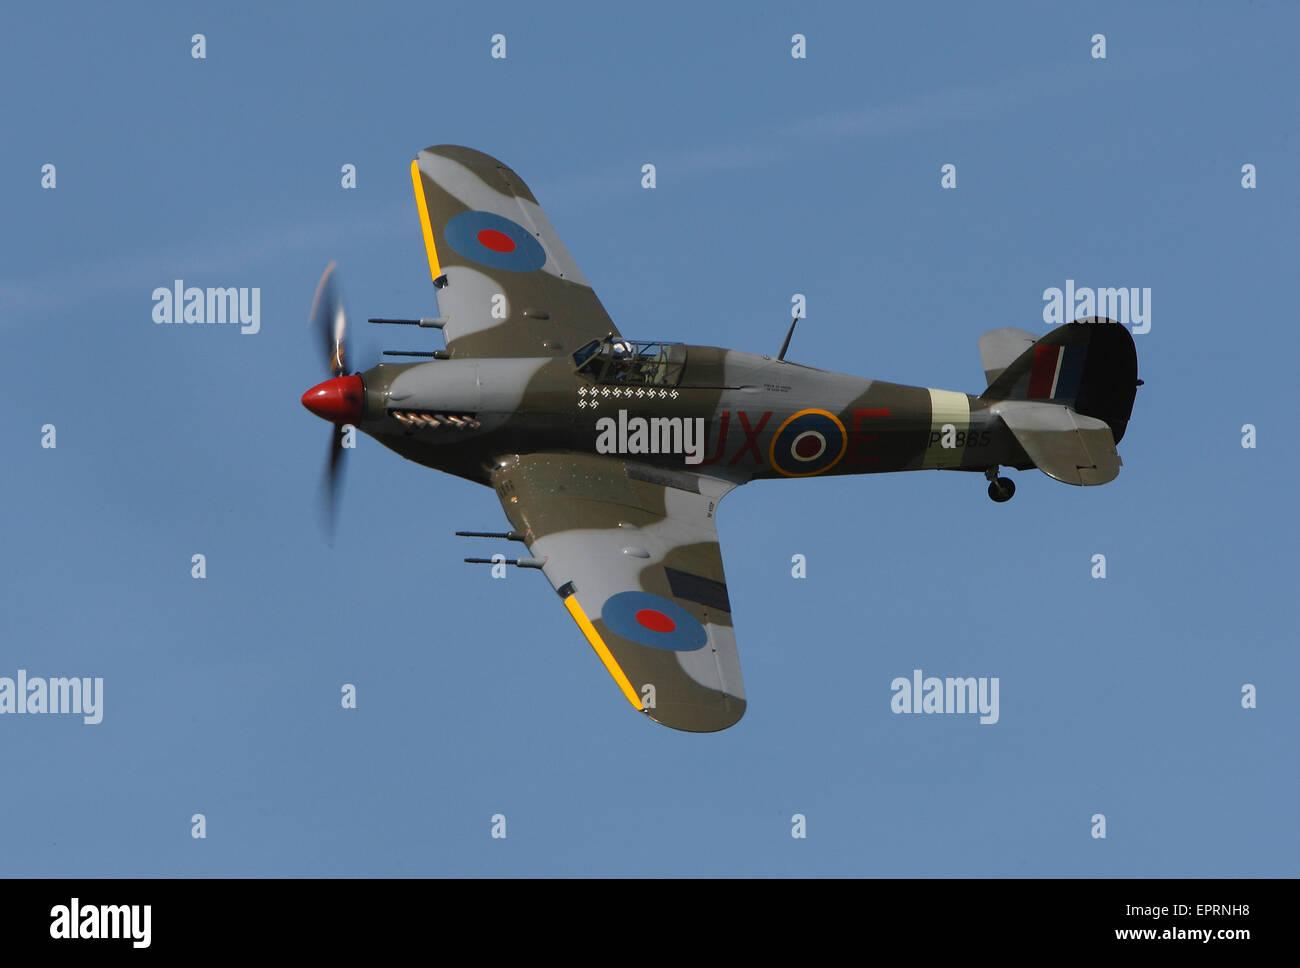 Hawker Hurricane, WW2,  fighter aircraft, warbird, Royal Air Force, RAF, flight - Stock Image